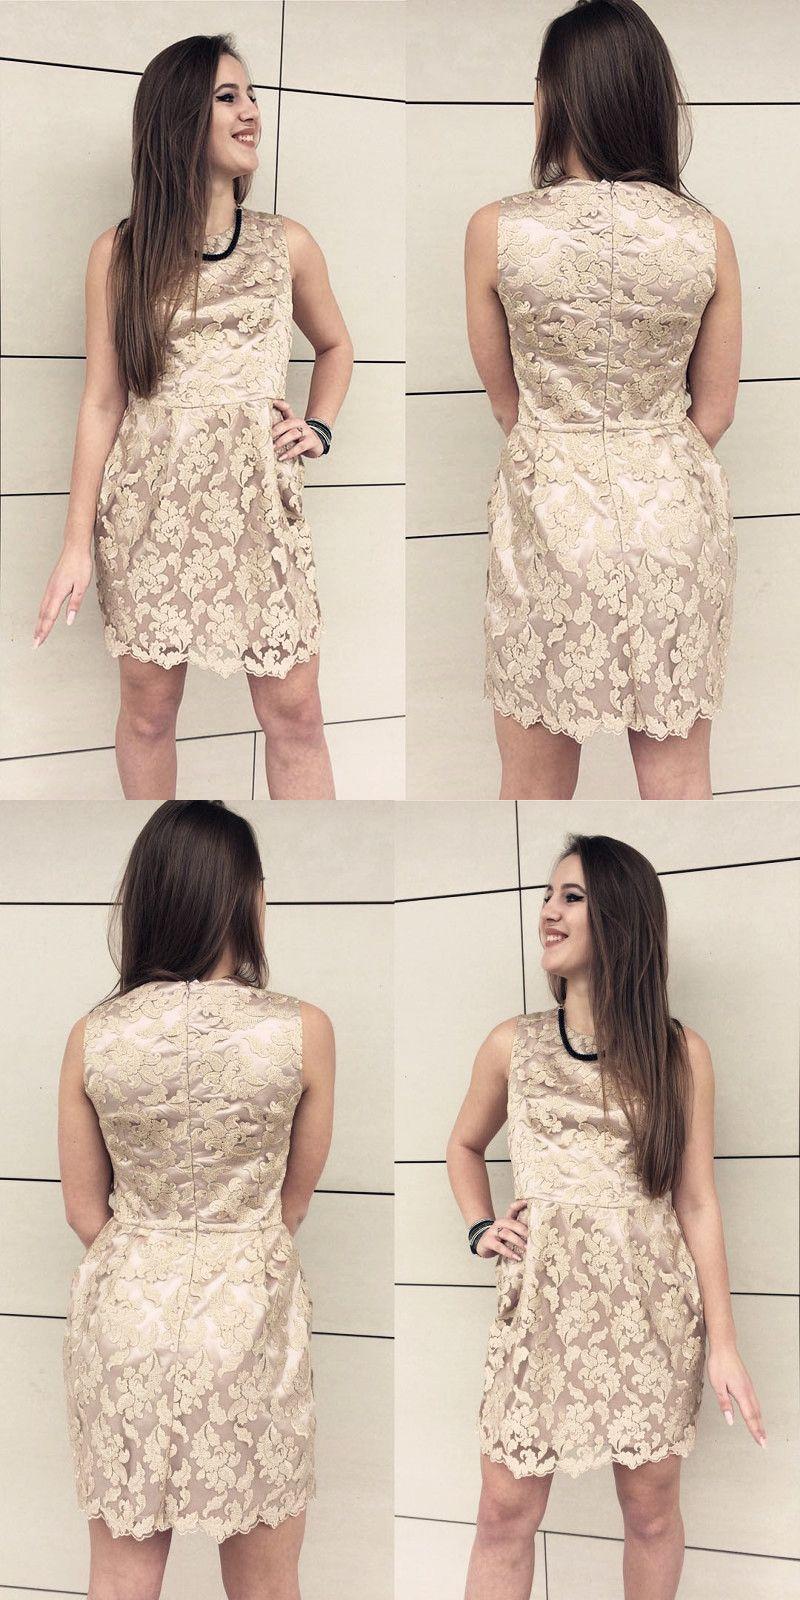 Jewel sleeveless light champagne lace short homecoming dress